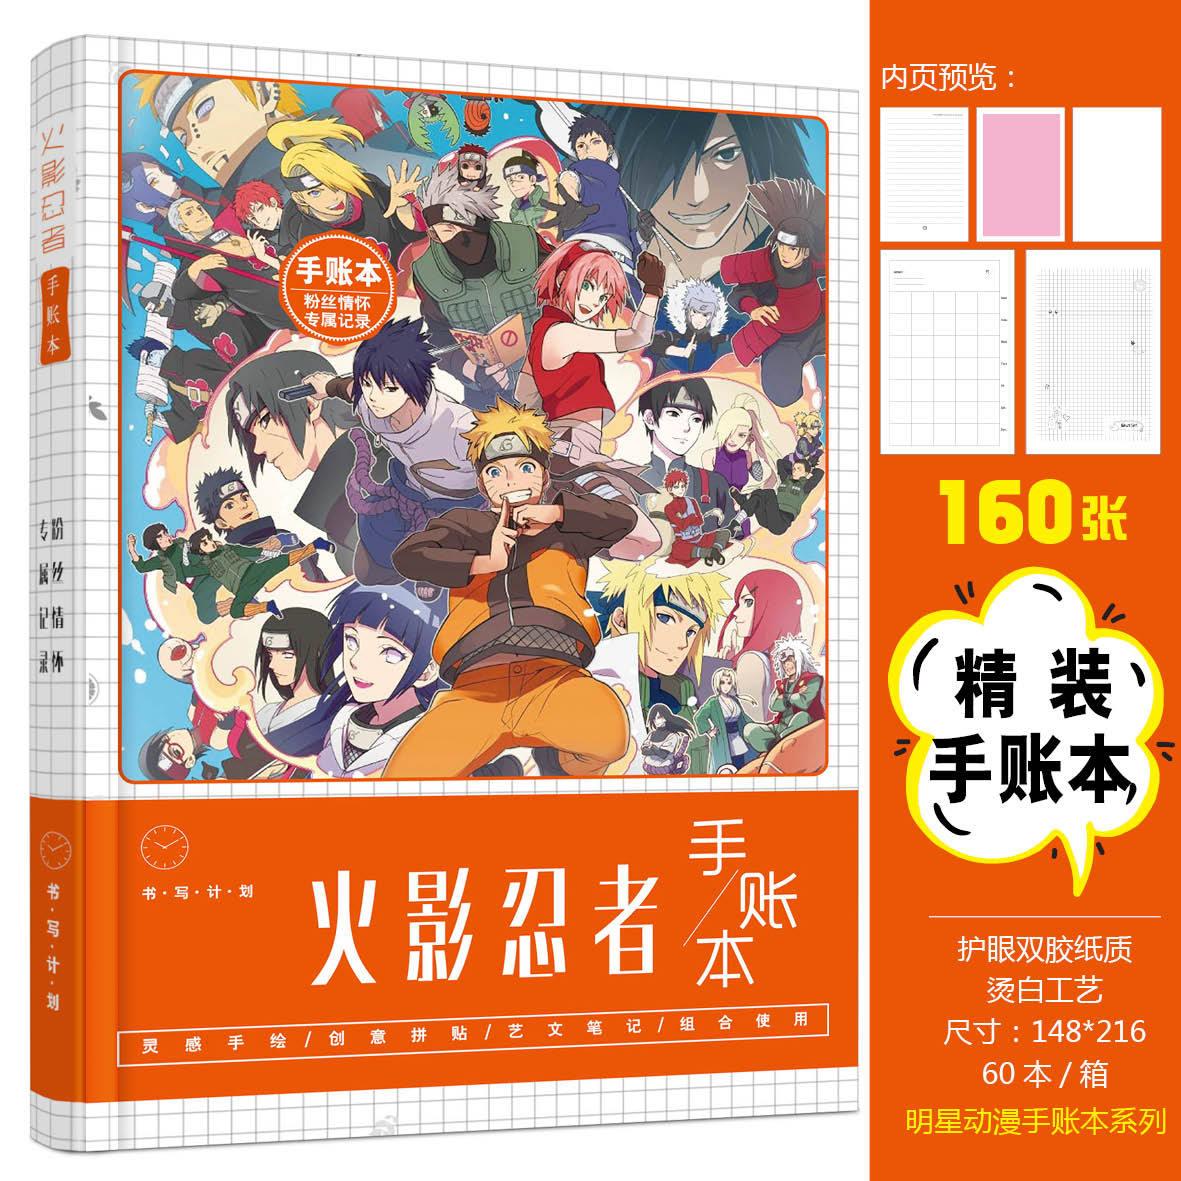 Giancomics Hot Japanese Comics Naruto Handbook Kakashi Figure Pocketbook Functional Eye protection Hand-painted Student Notebook